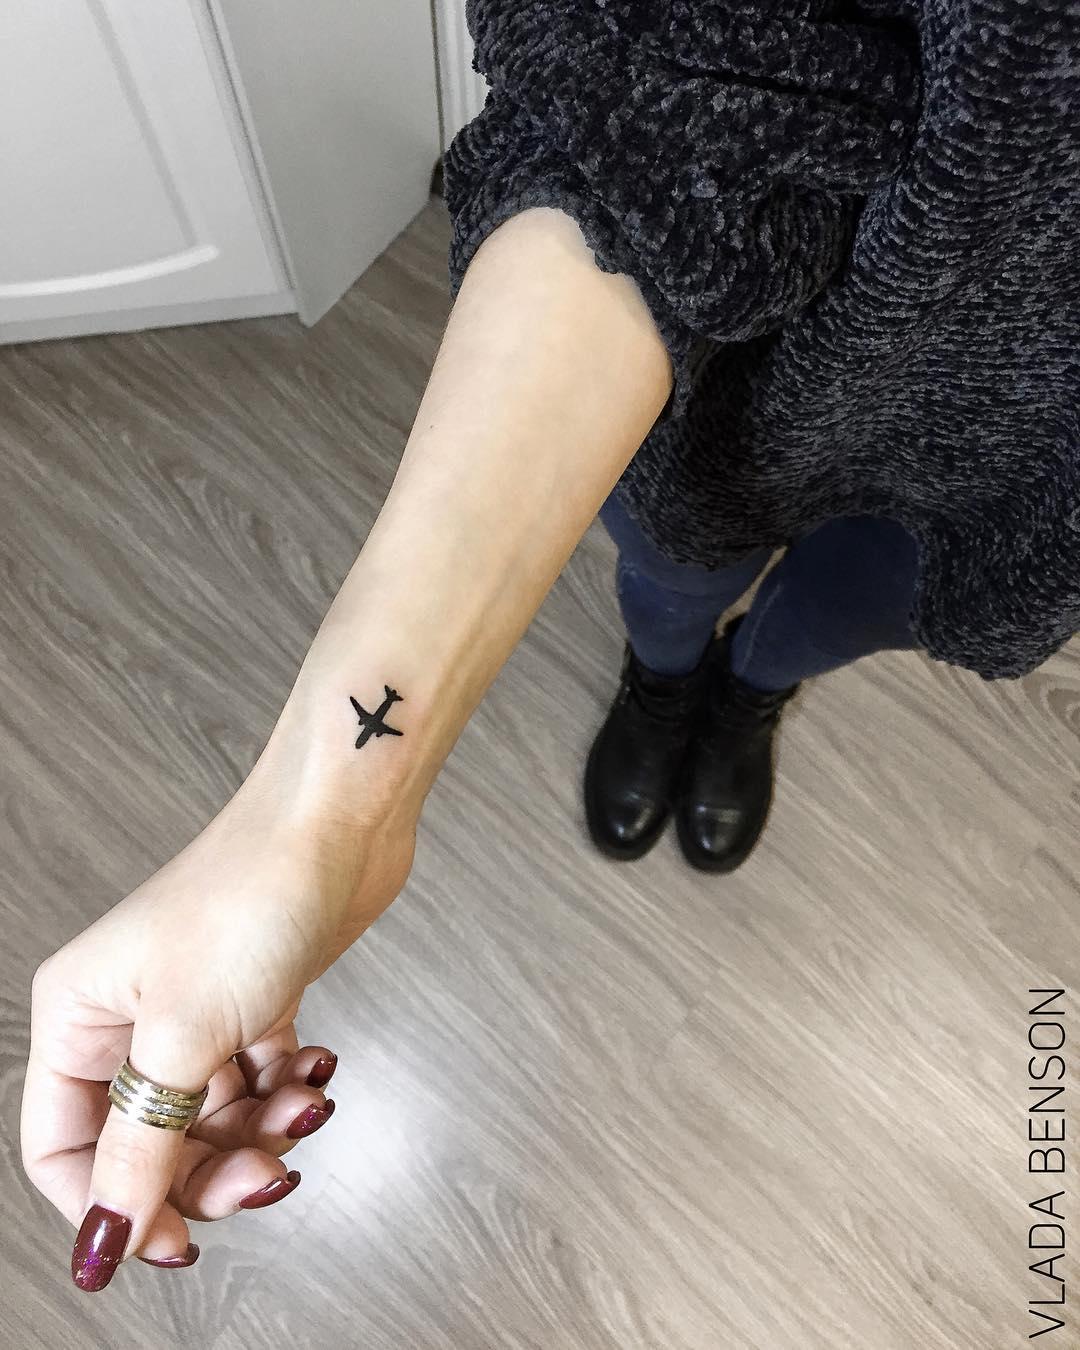 tattoo aereoplano by @vladabenson